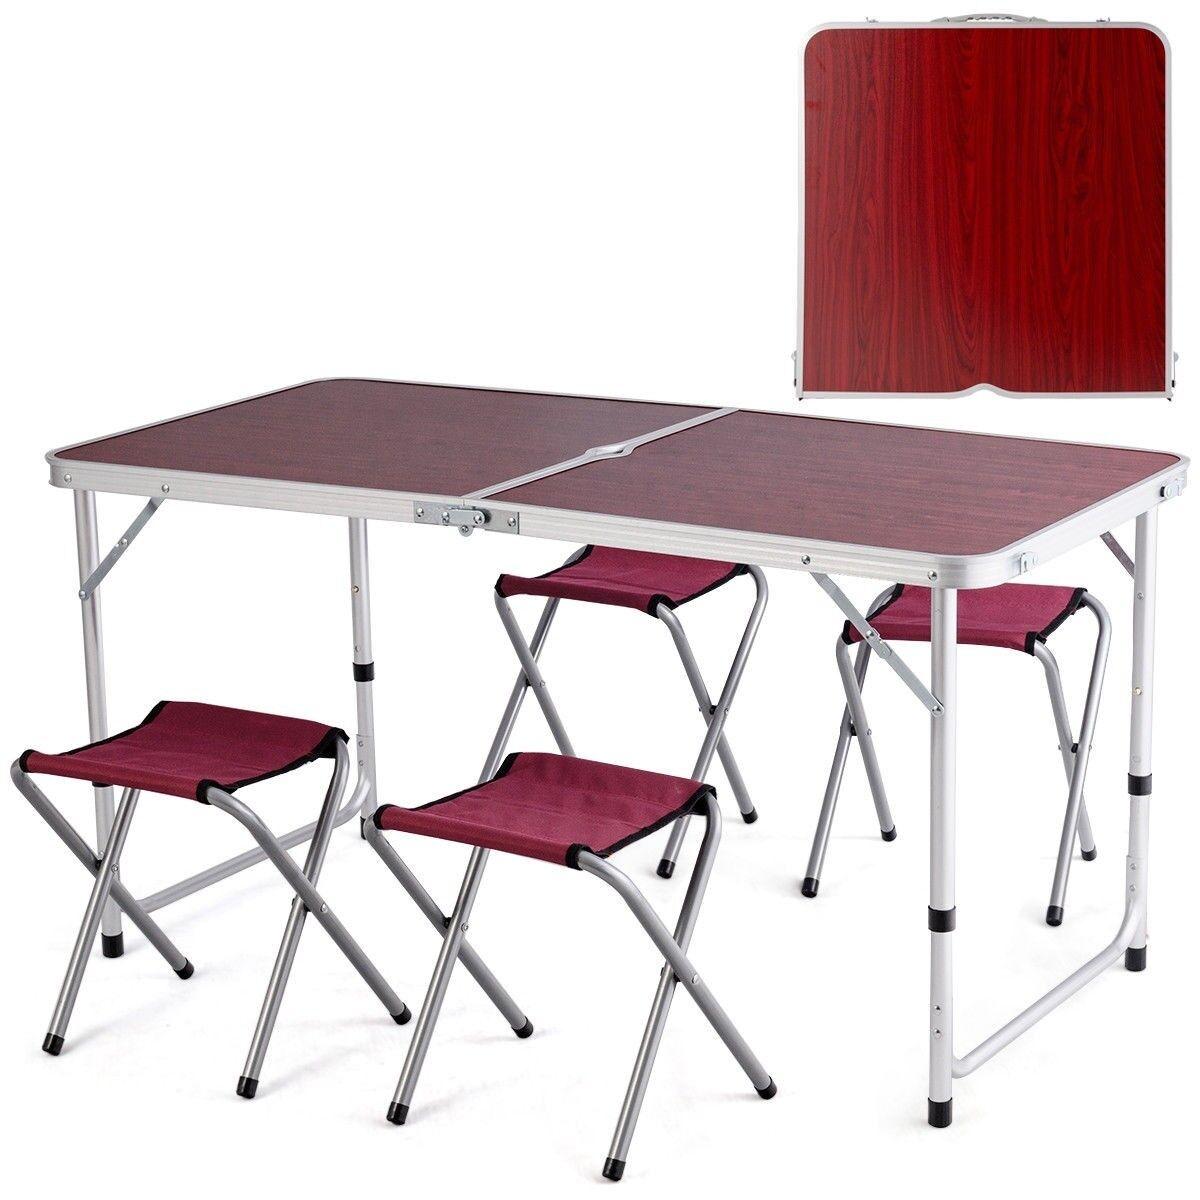 Al aire libre, barbacoa, aluminio, mesa plegable, cuatro sillas, muebles.